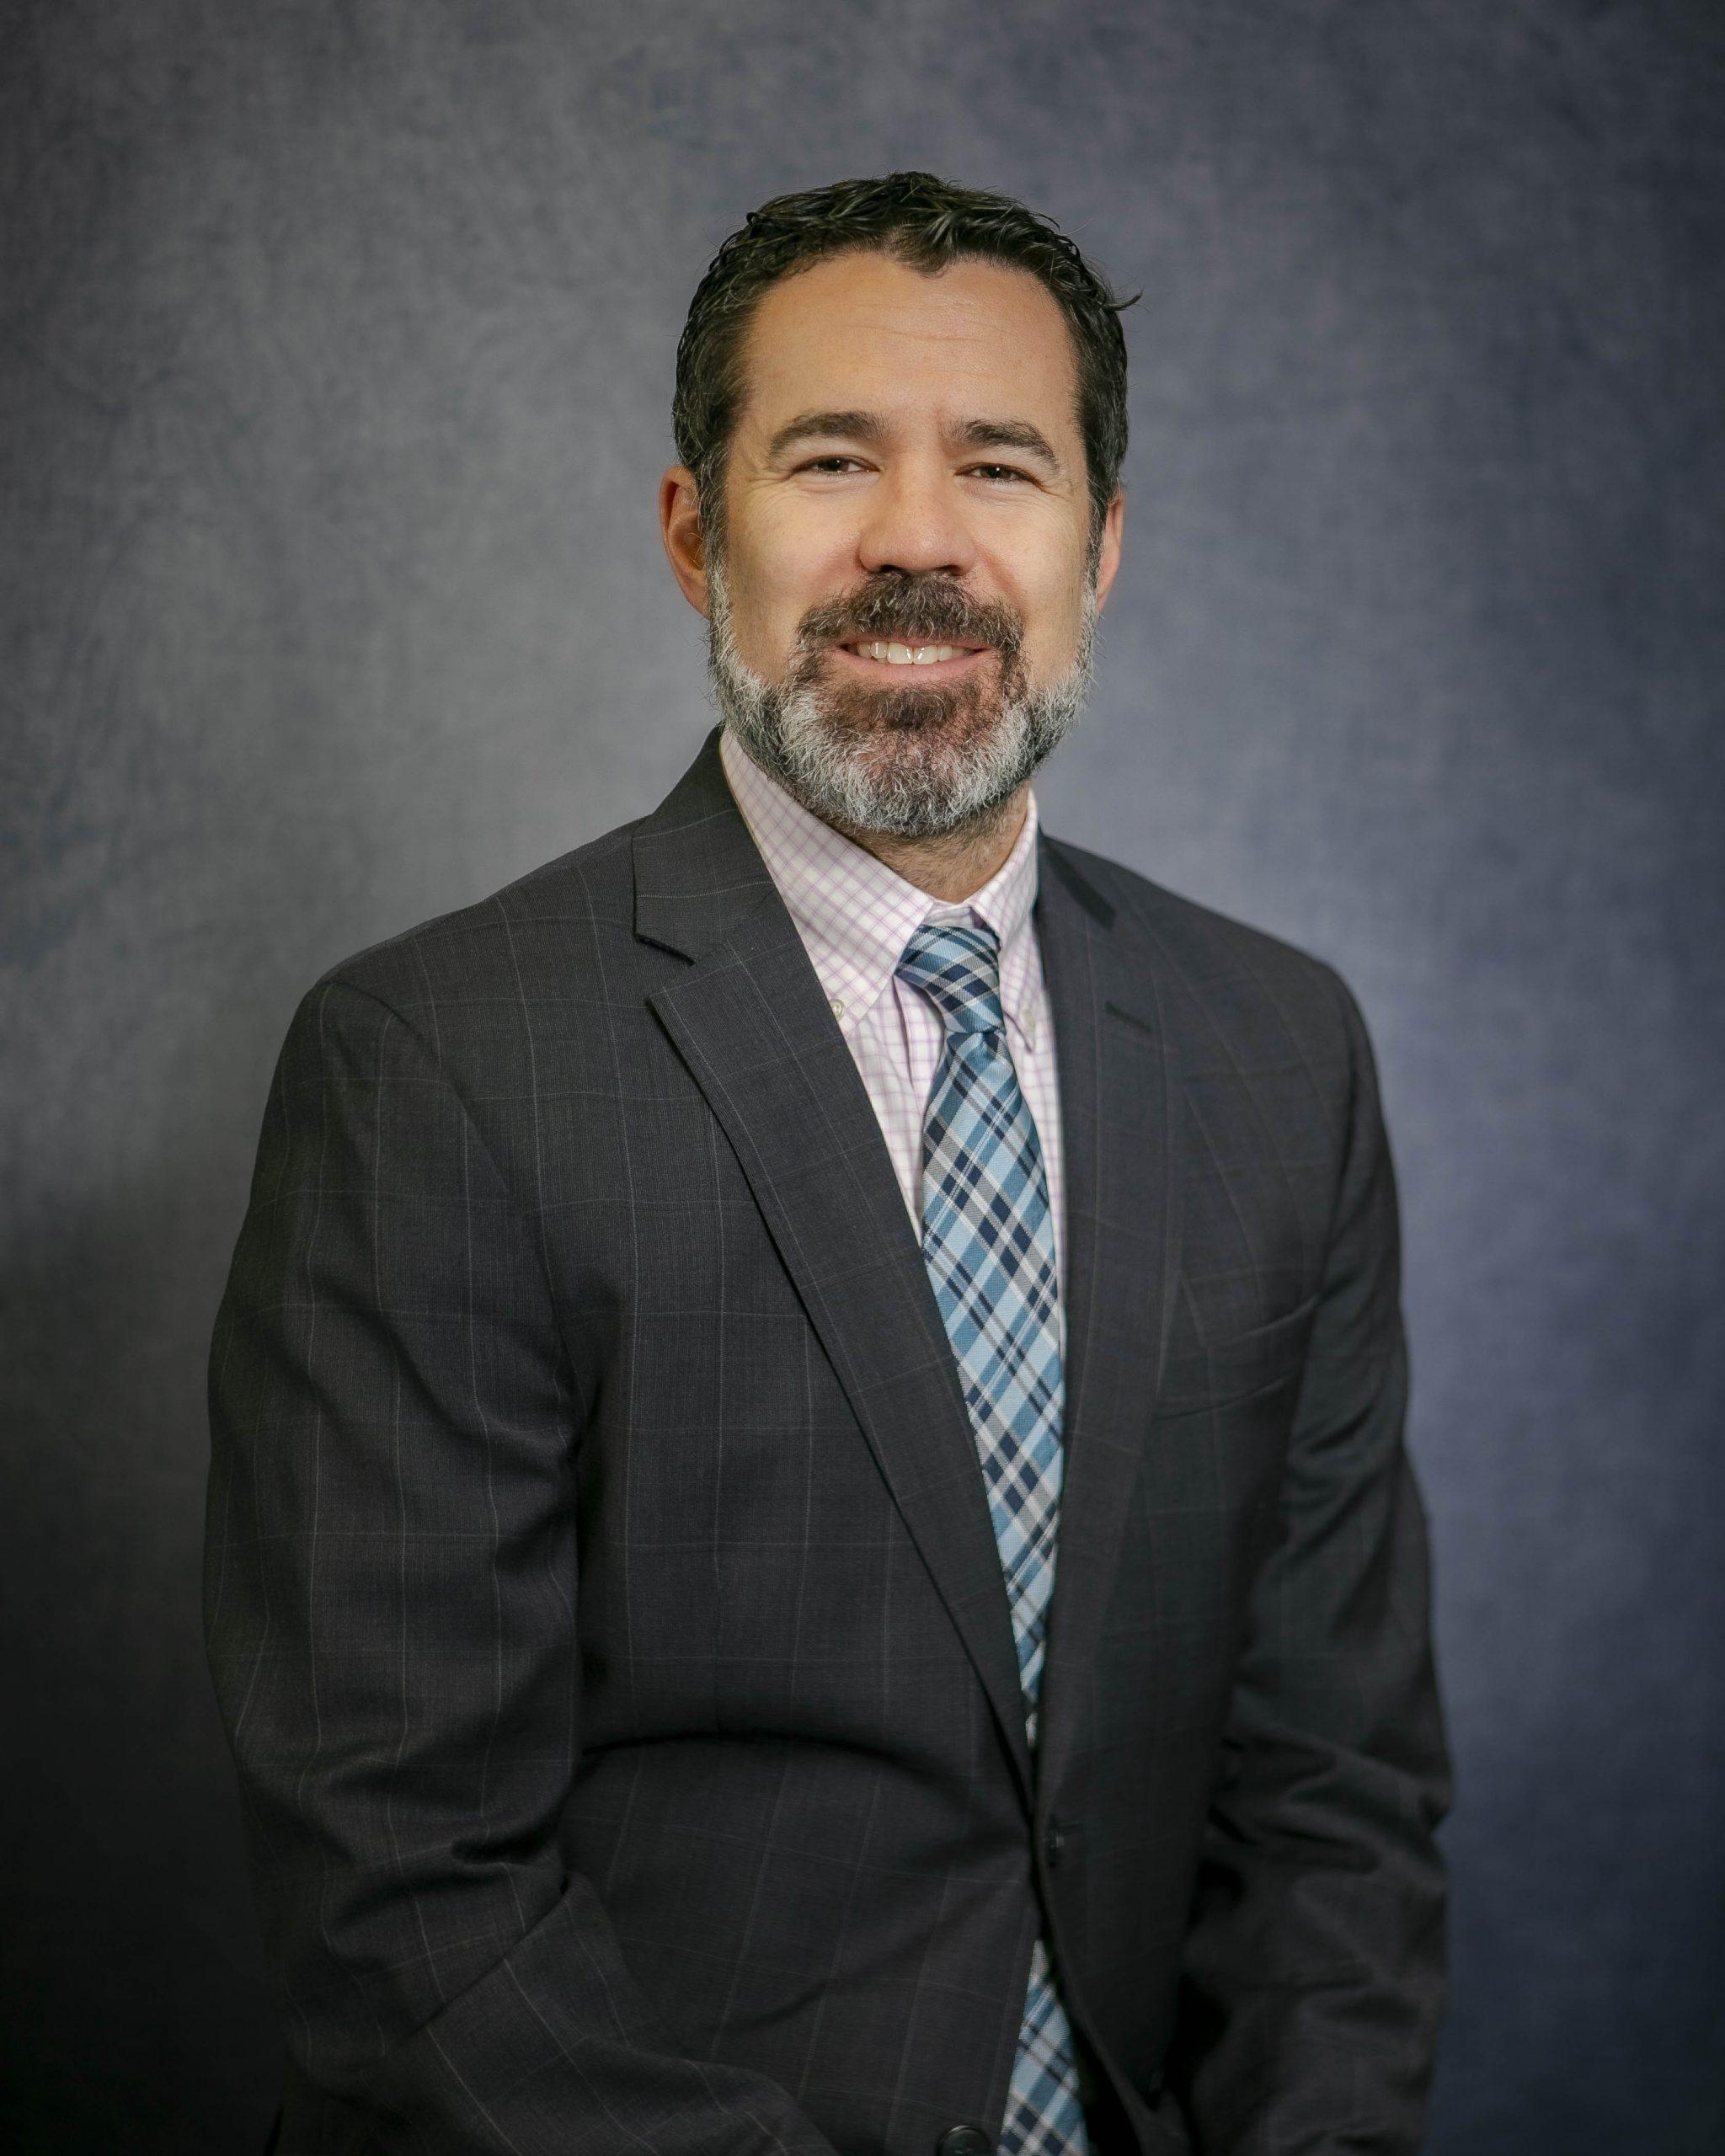 Matthew J. Gindele